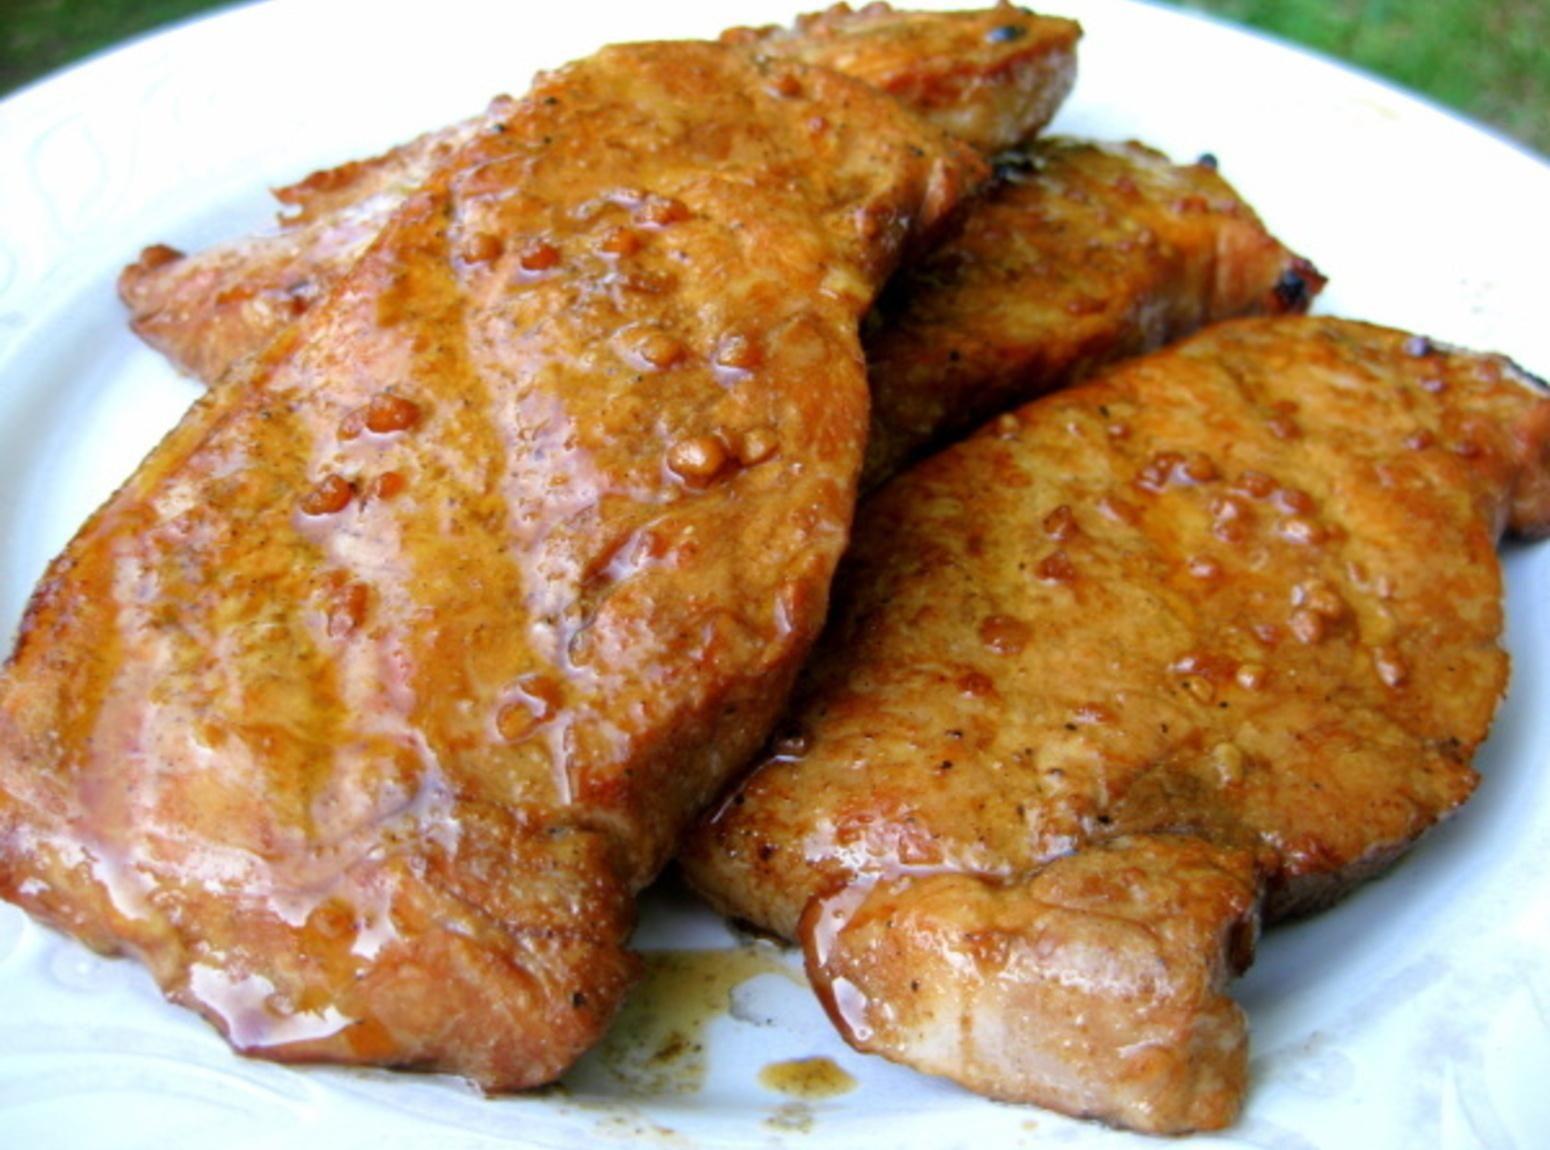 Different ways to cook pork chops - Cumin Grilled Pork Chops